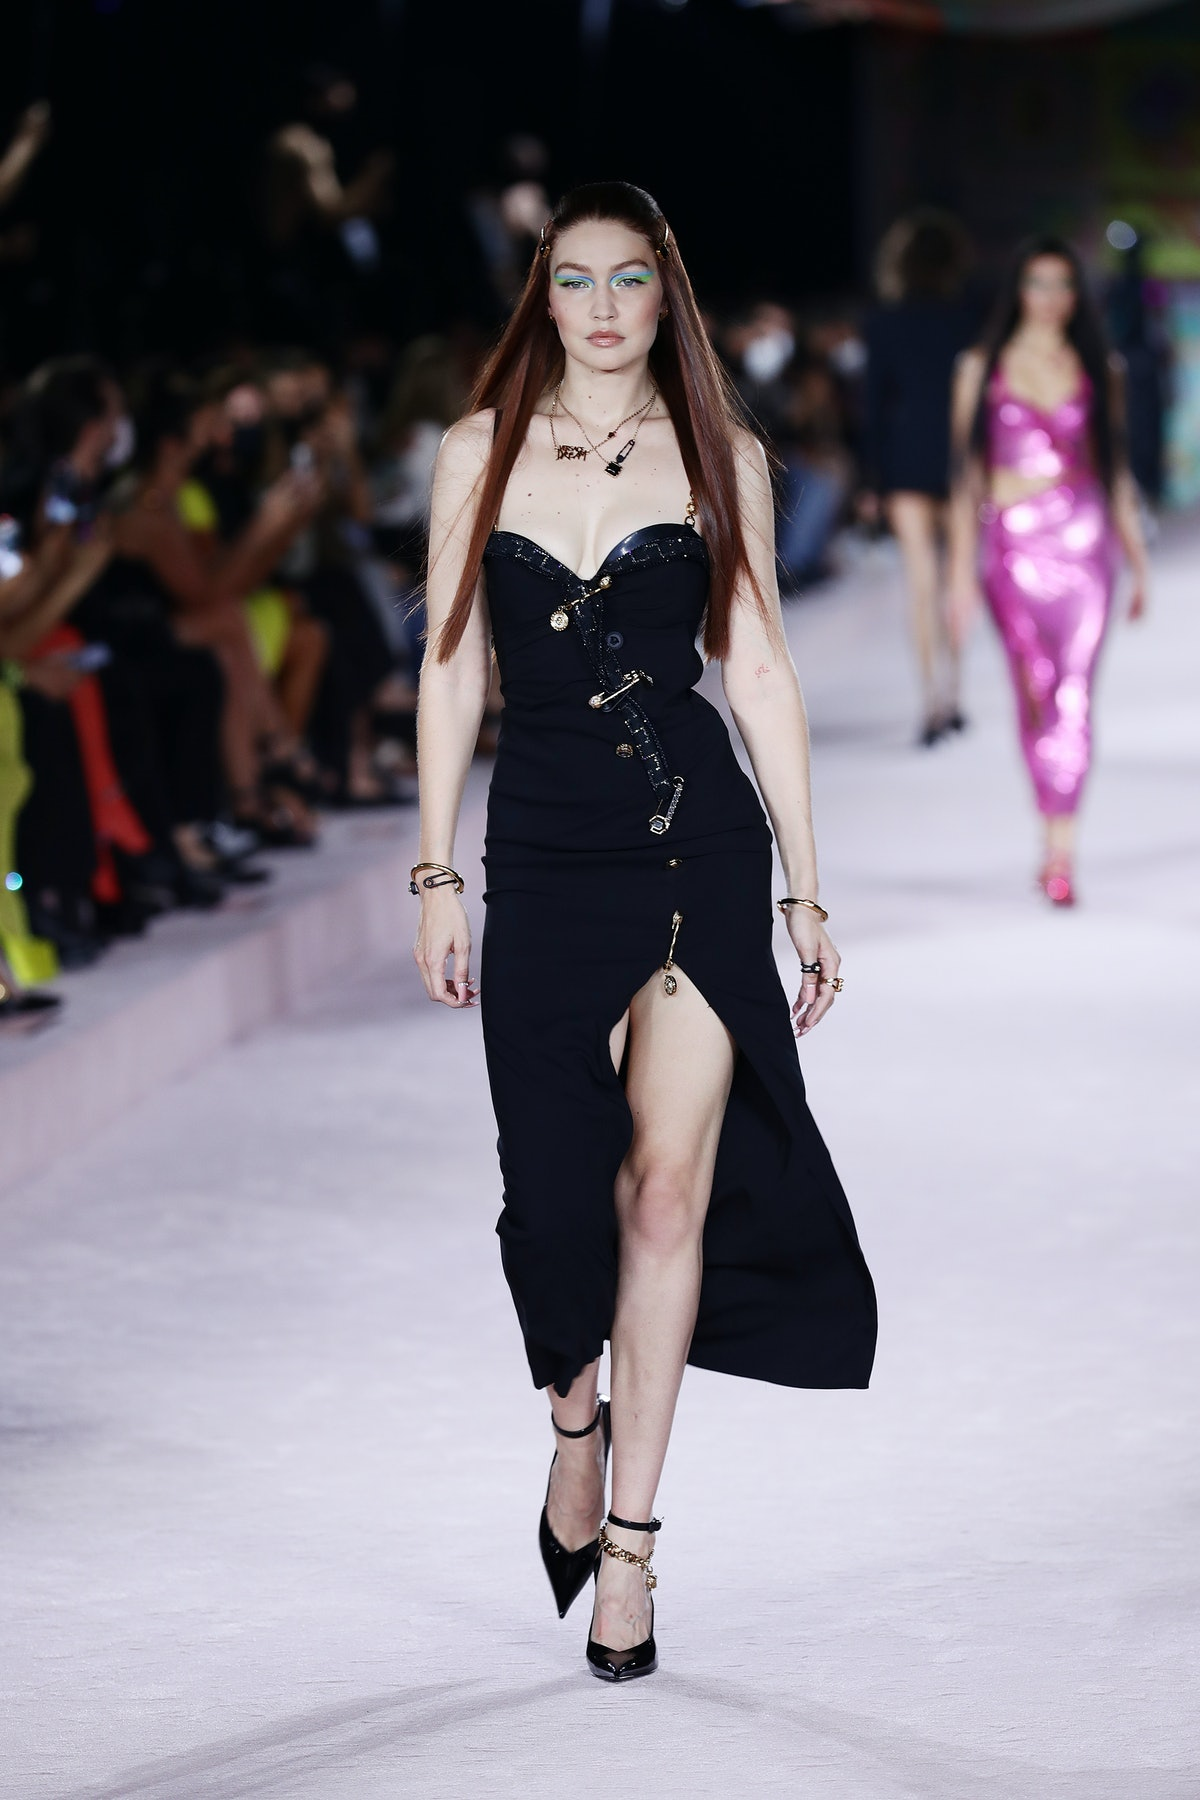 MILAN, ITALY - SEPTEMBER 24: Gigi Hadid walks the runway at the Versace fashion show during the Mila...